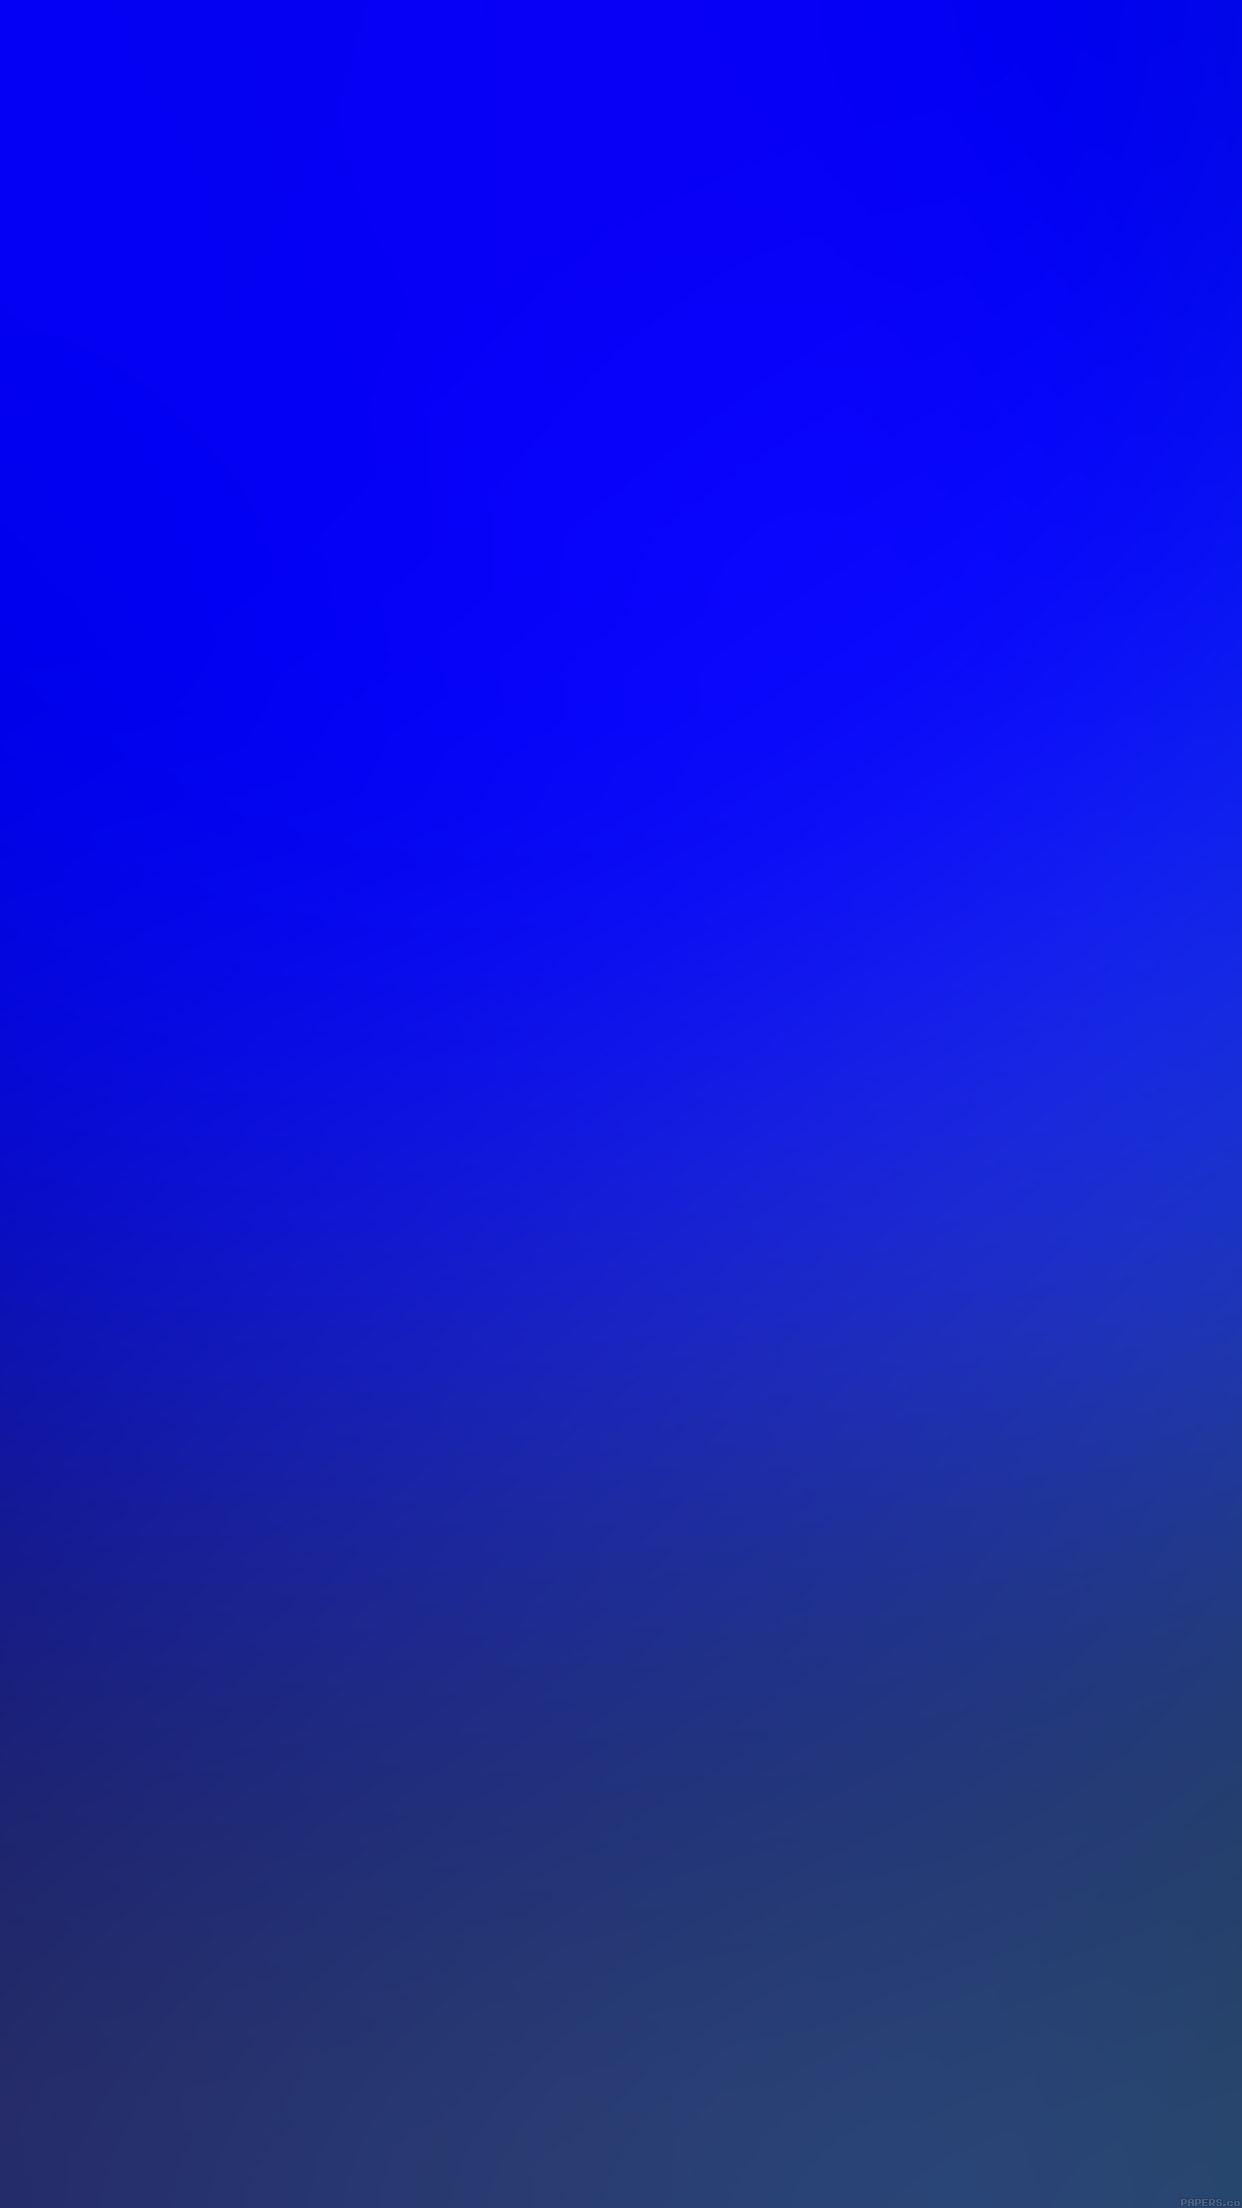 Iphonepapers Sb20 Wallpaper Feeling Blue Sea Blur